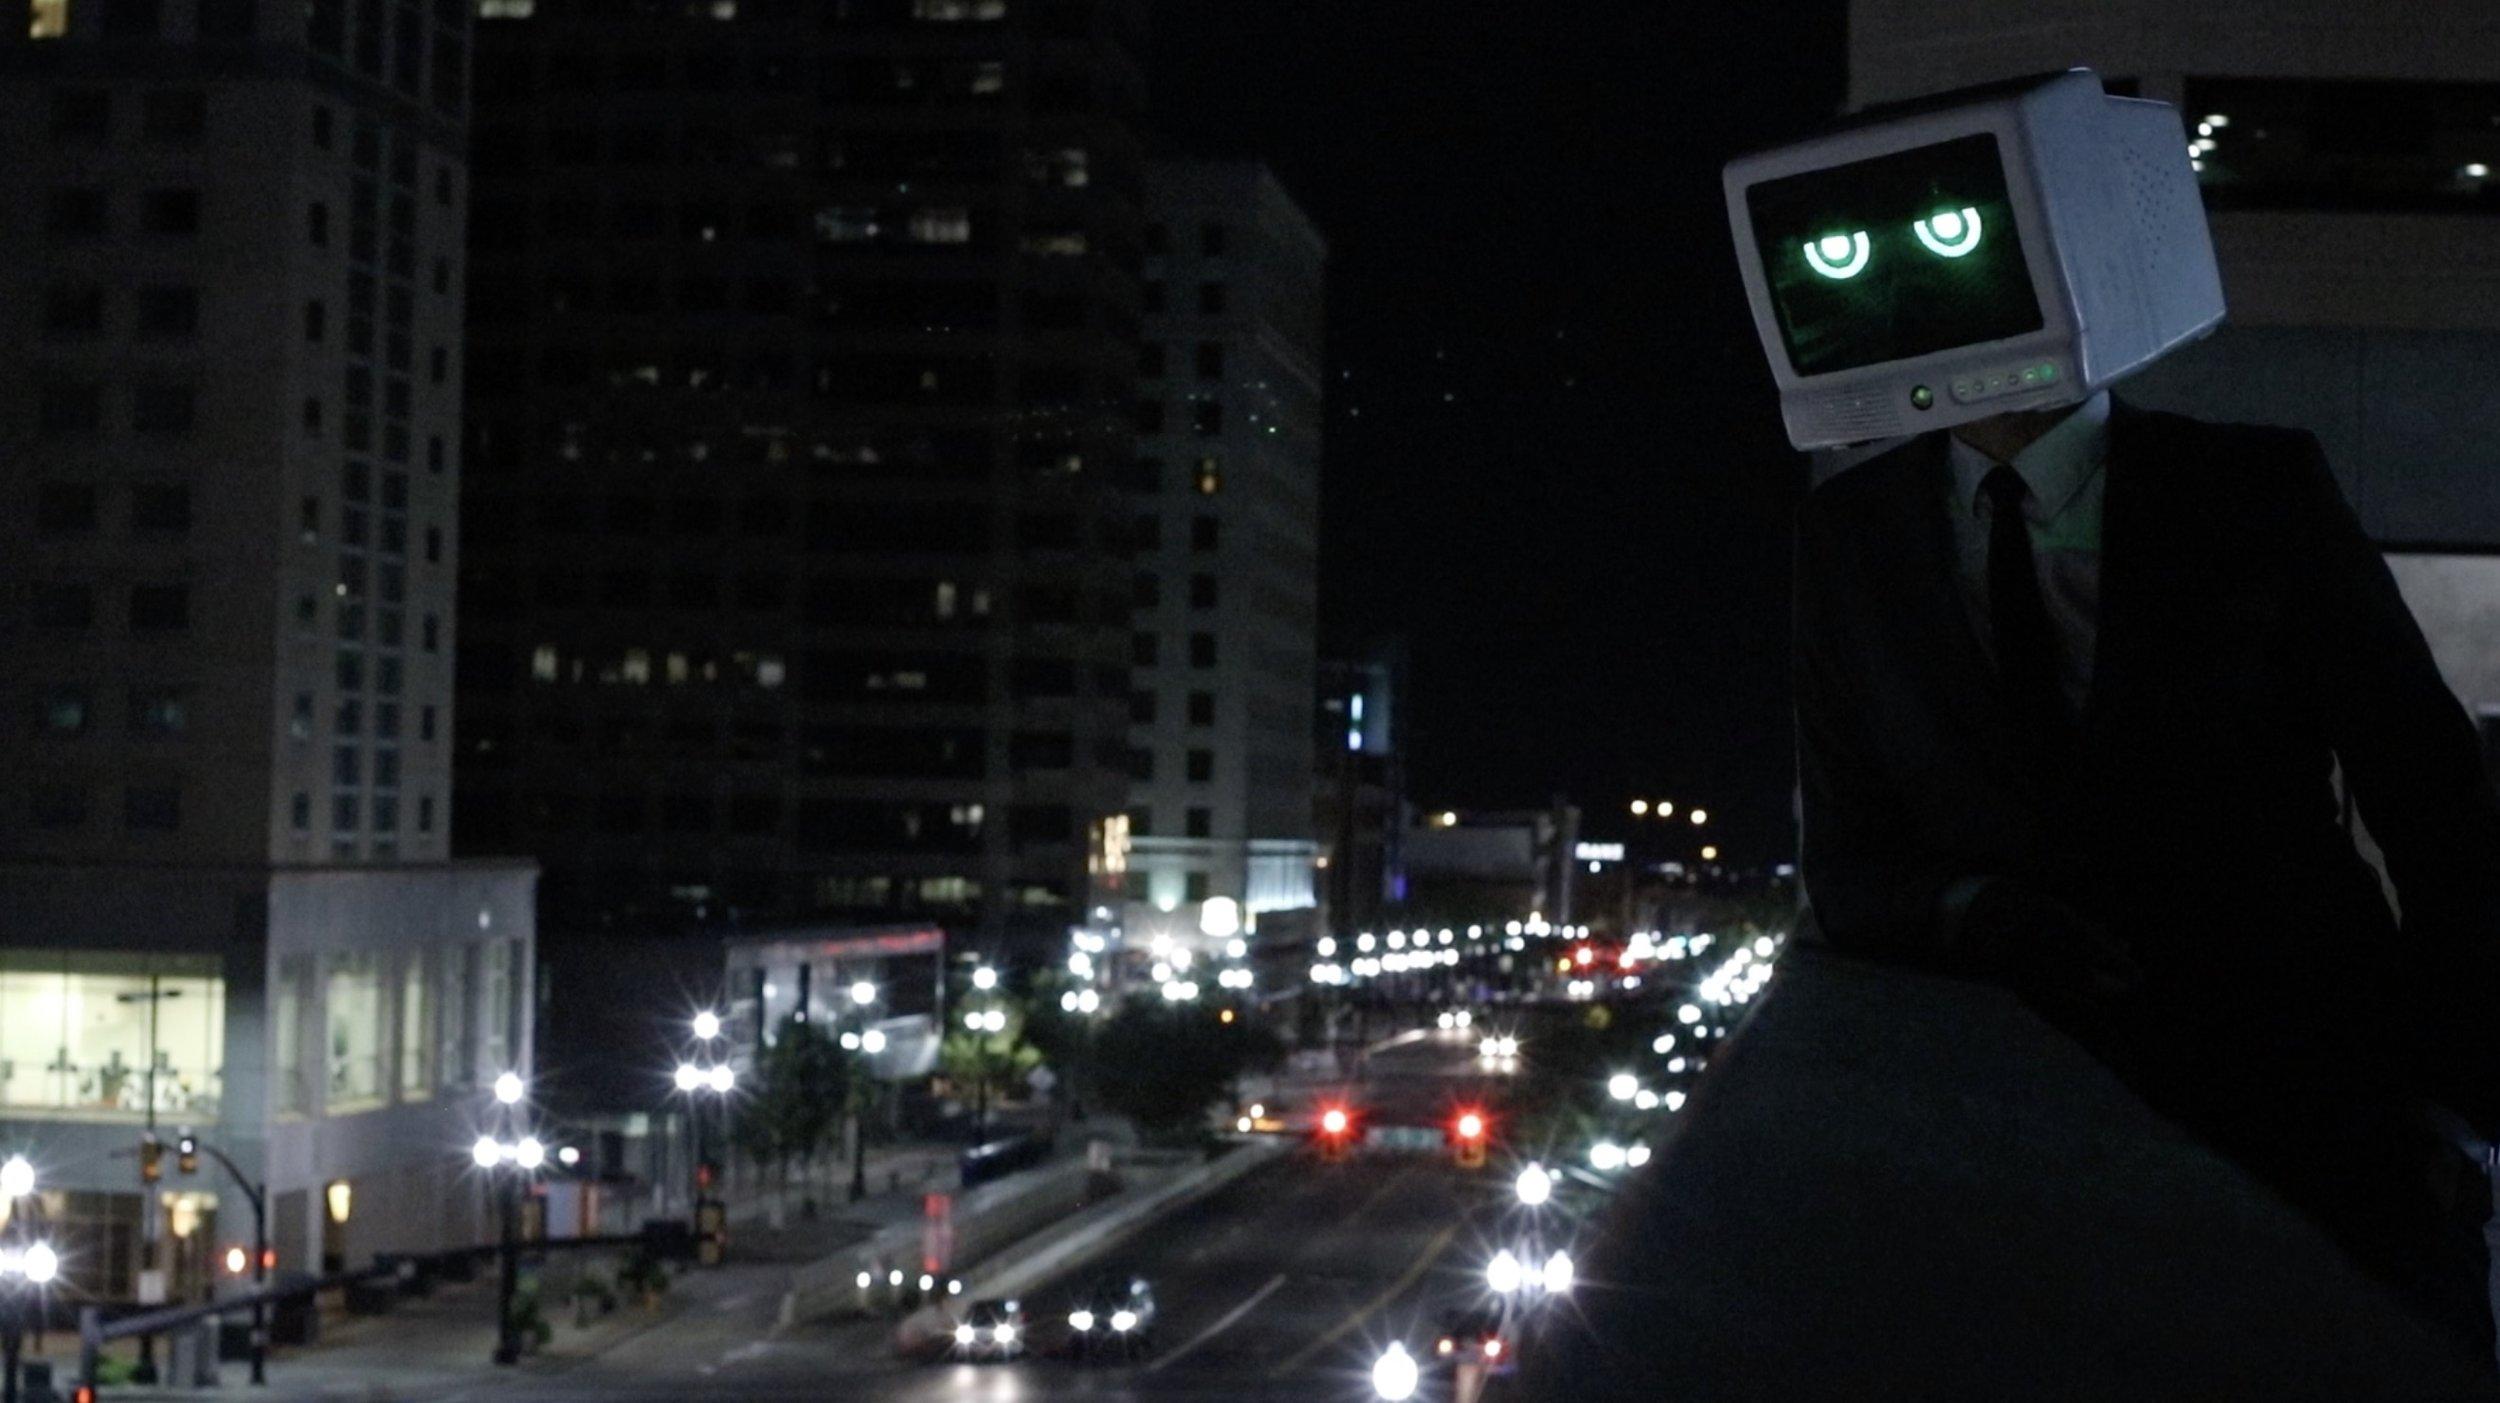 rd city street overlook.jpg